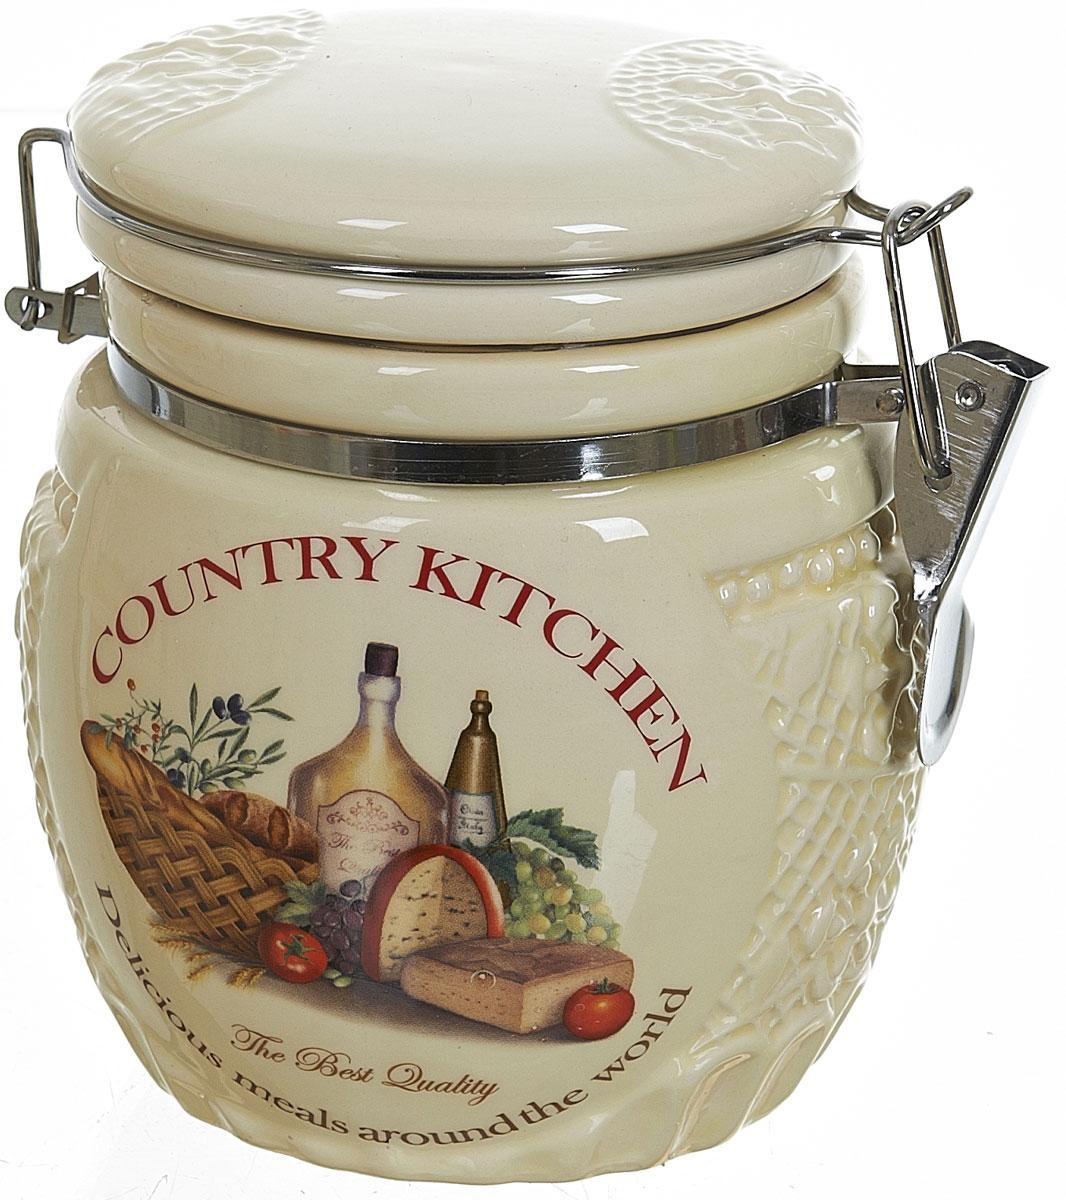 Банка для сыпучих продуктов Polystar Country Kitchen, 730 мл банка для сыпучих продуктов polystar sweet home 850 мл